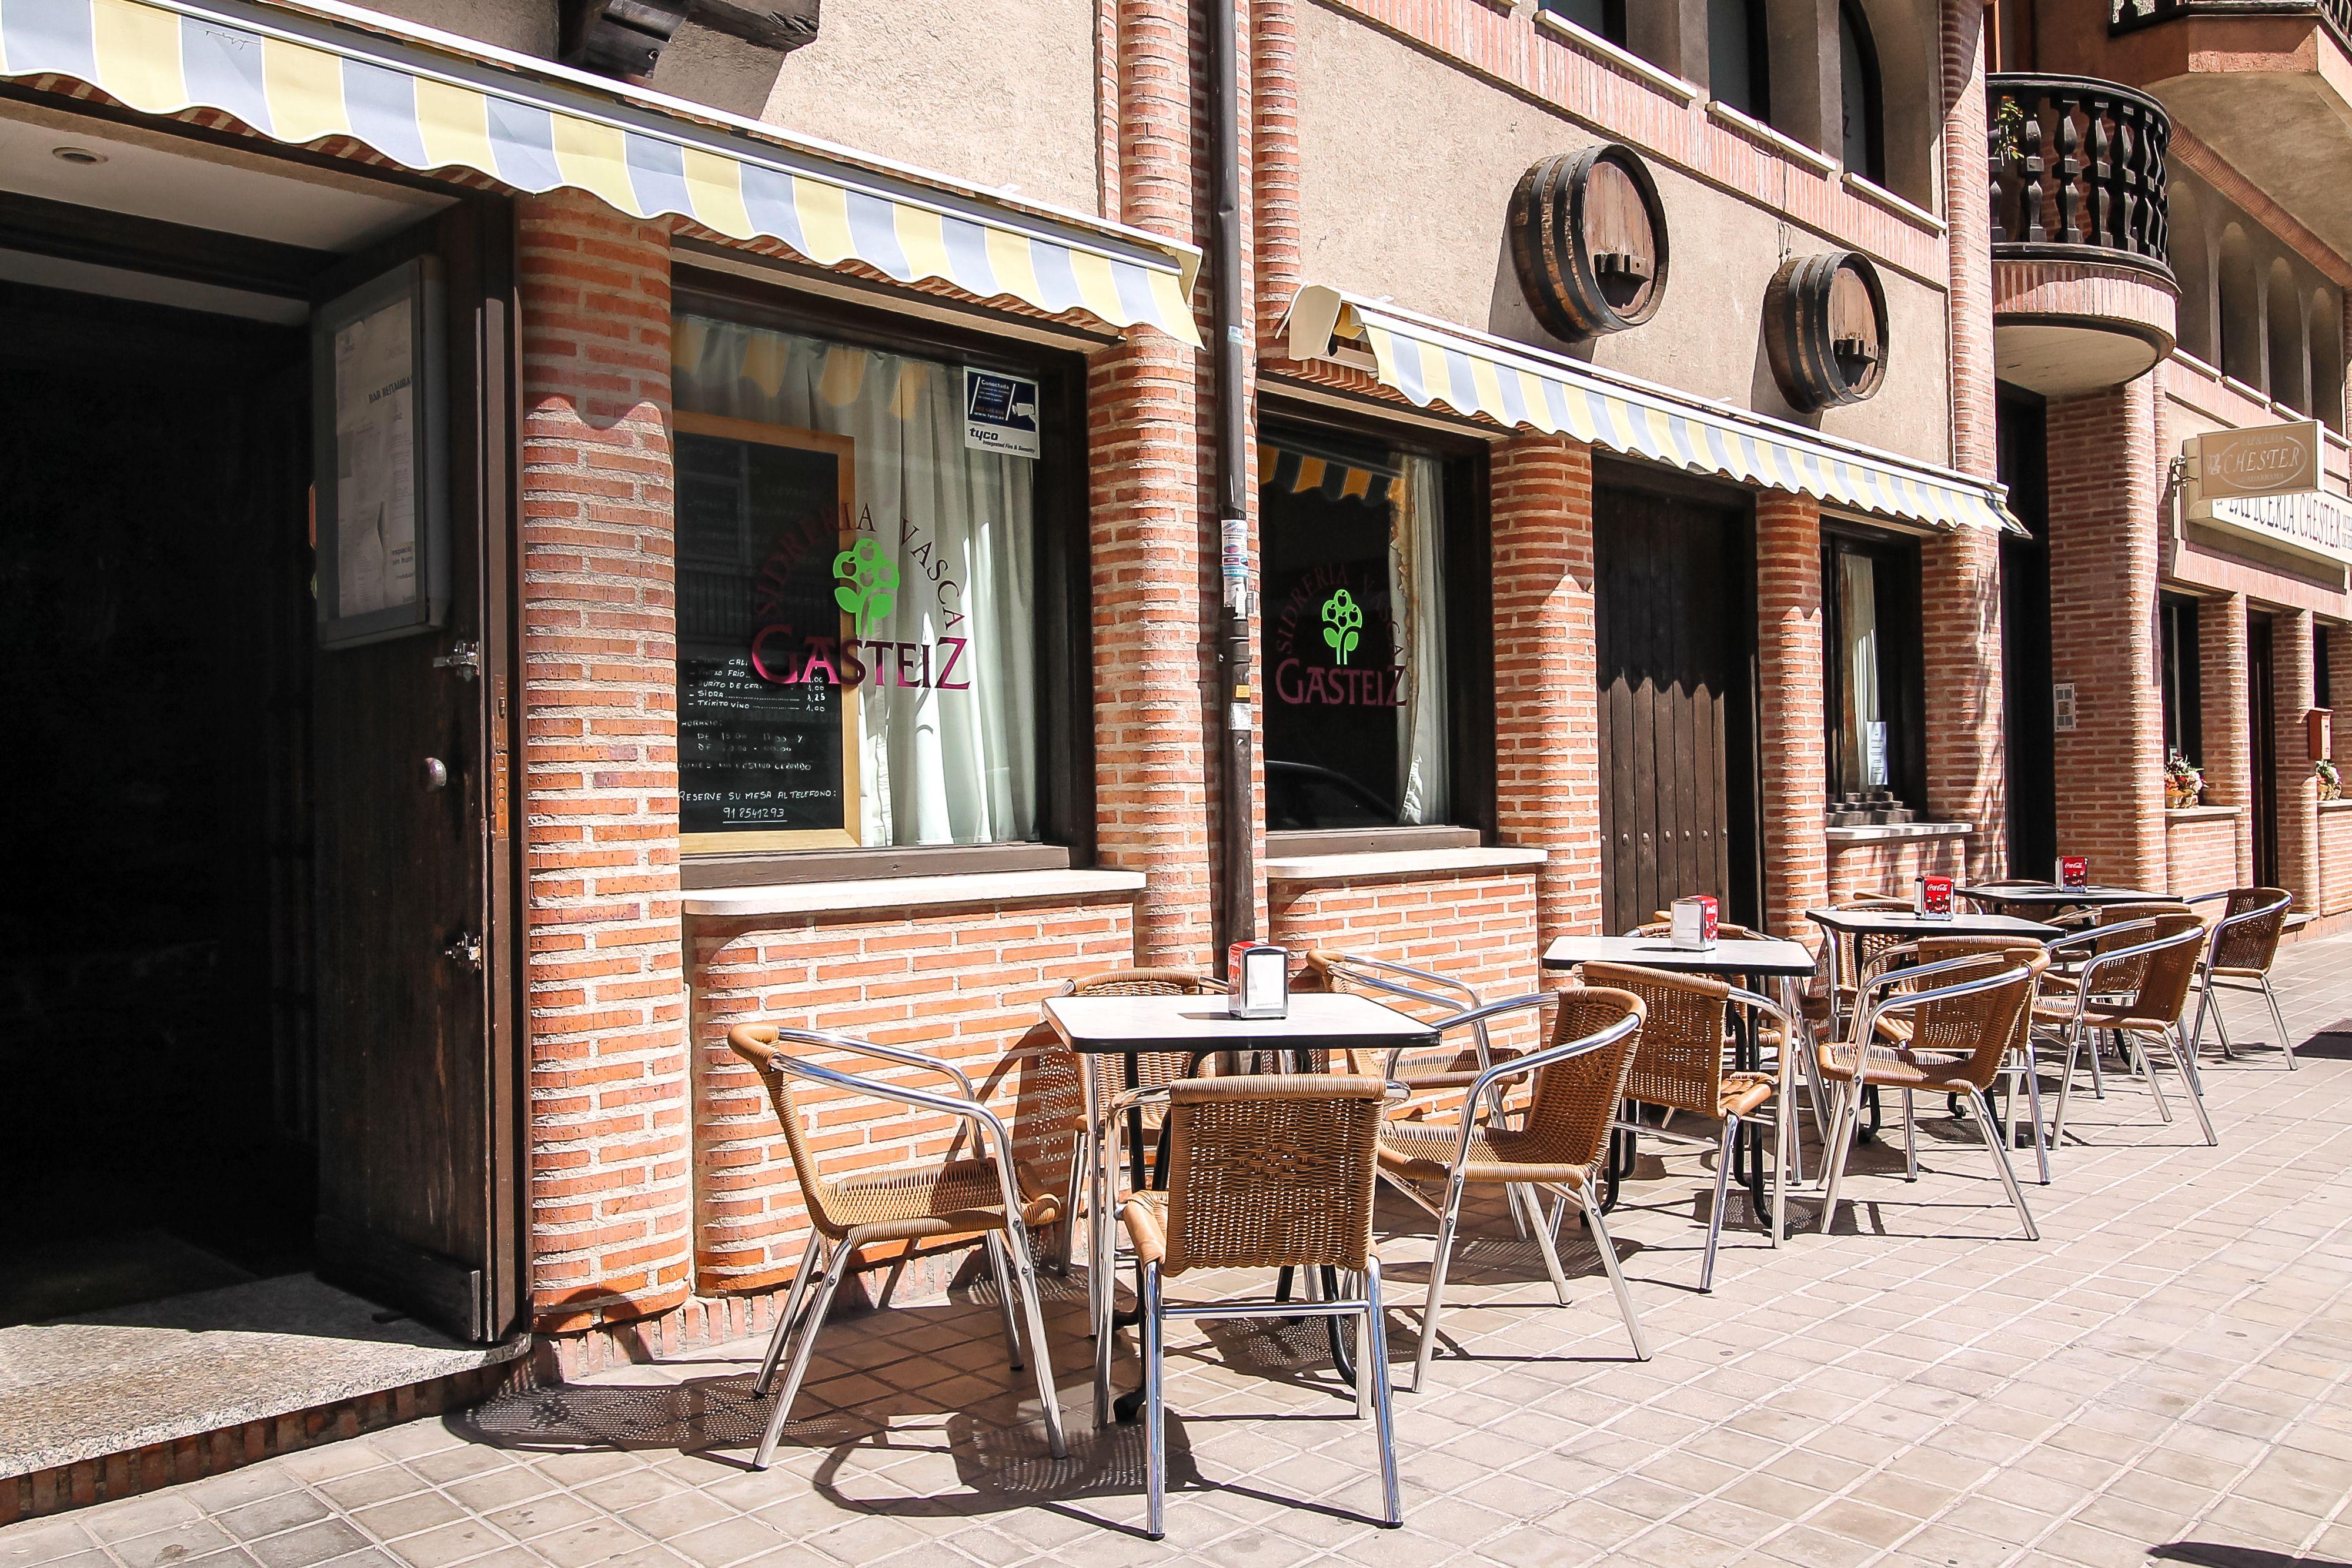 Foto 1 de Cocina vasca en Guadarrama | Sidrería Vasca Gasteiz